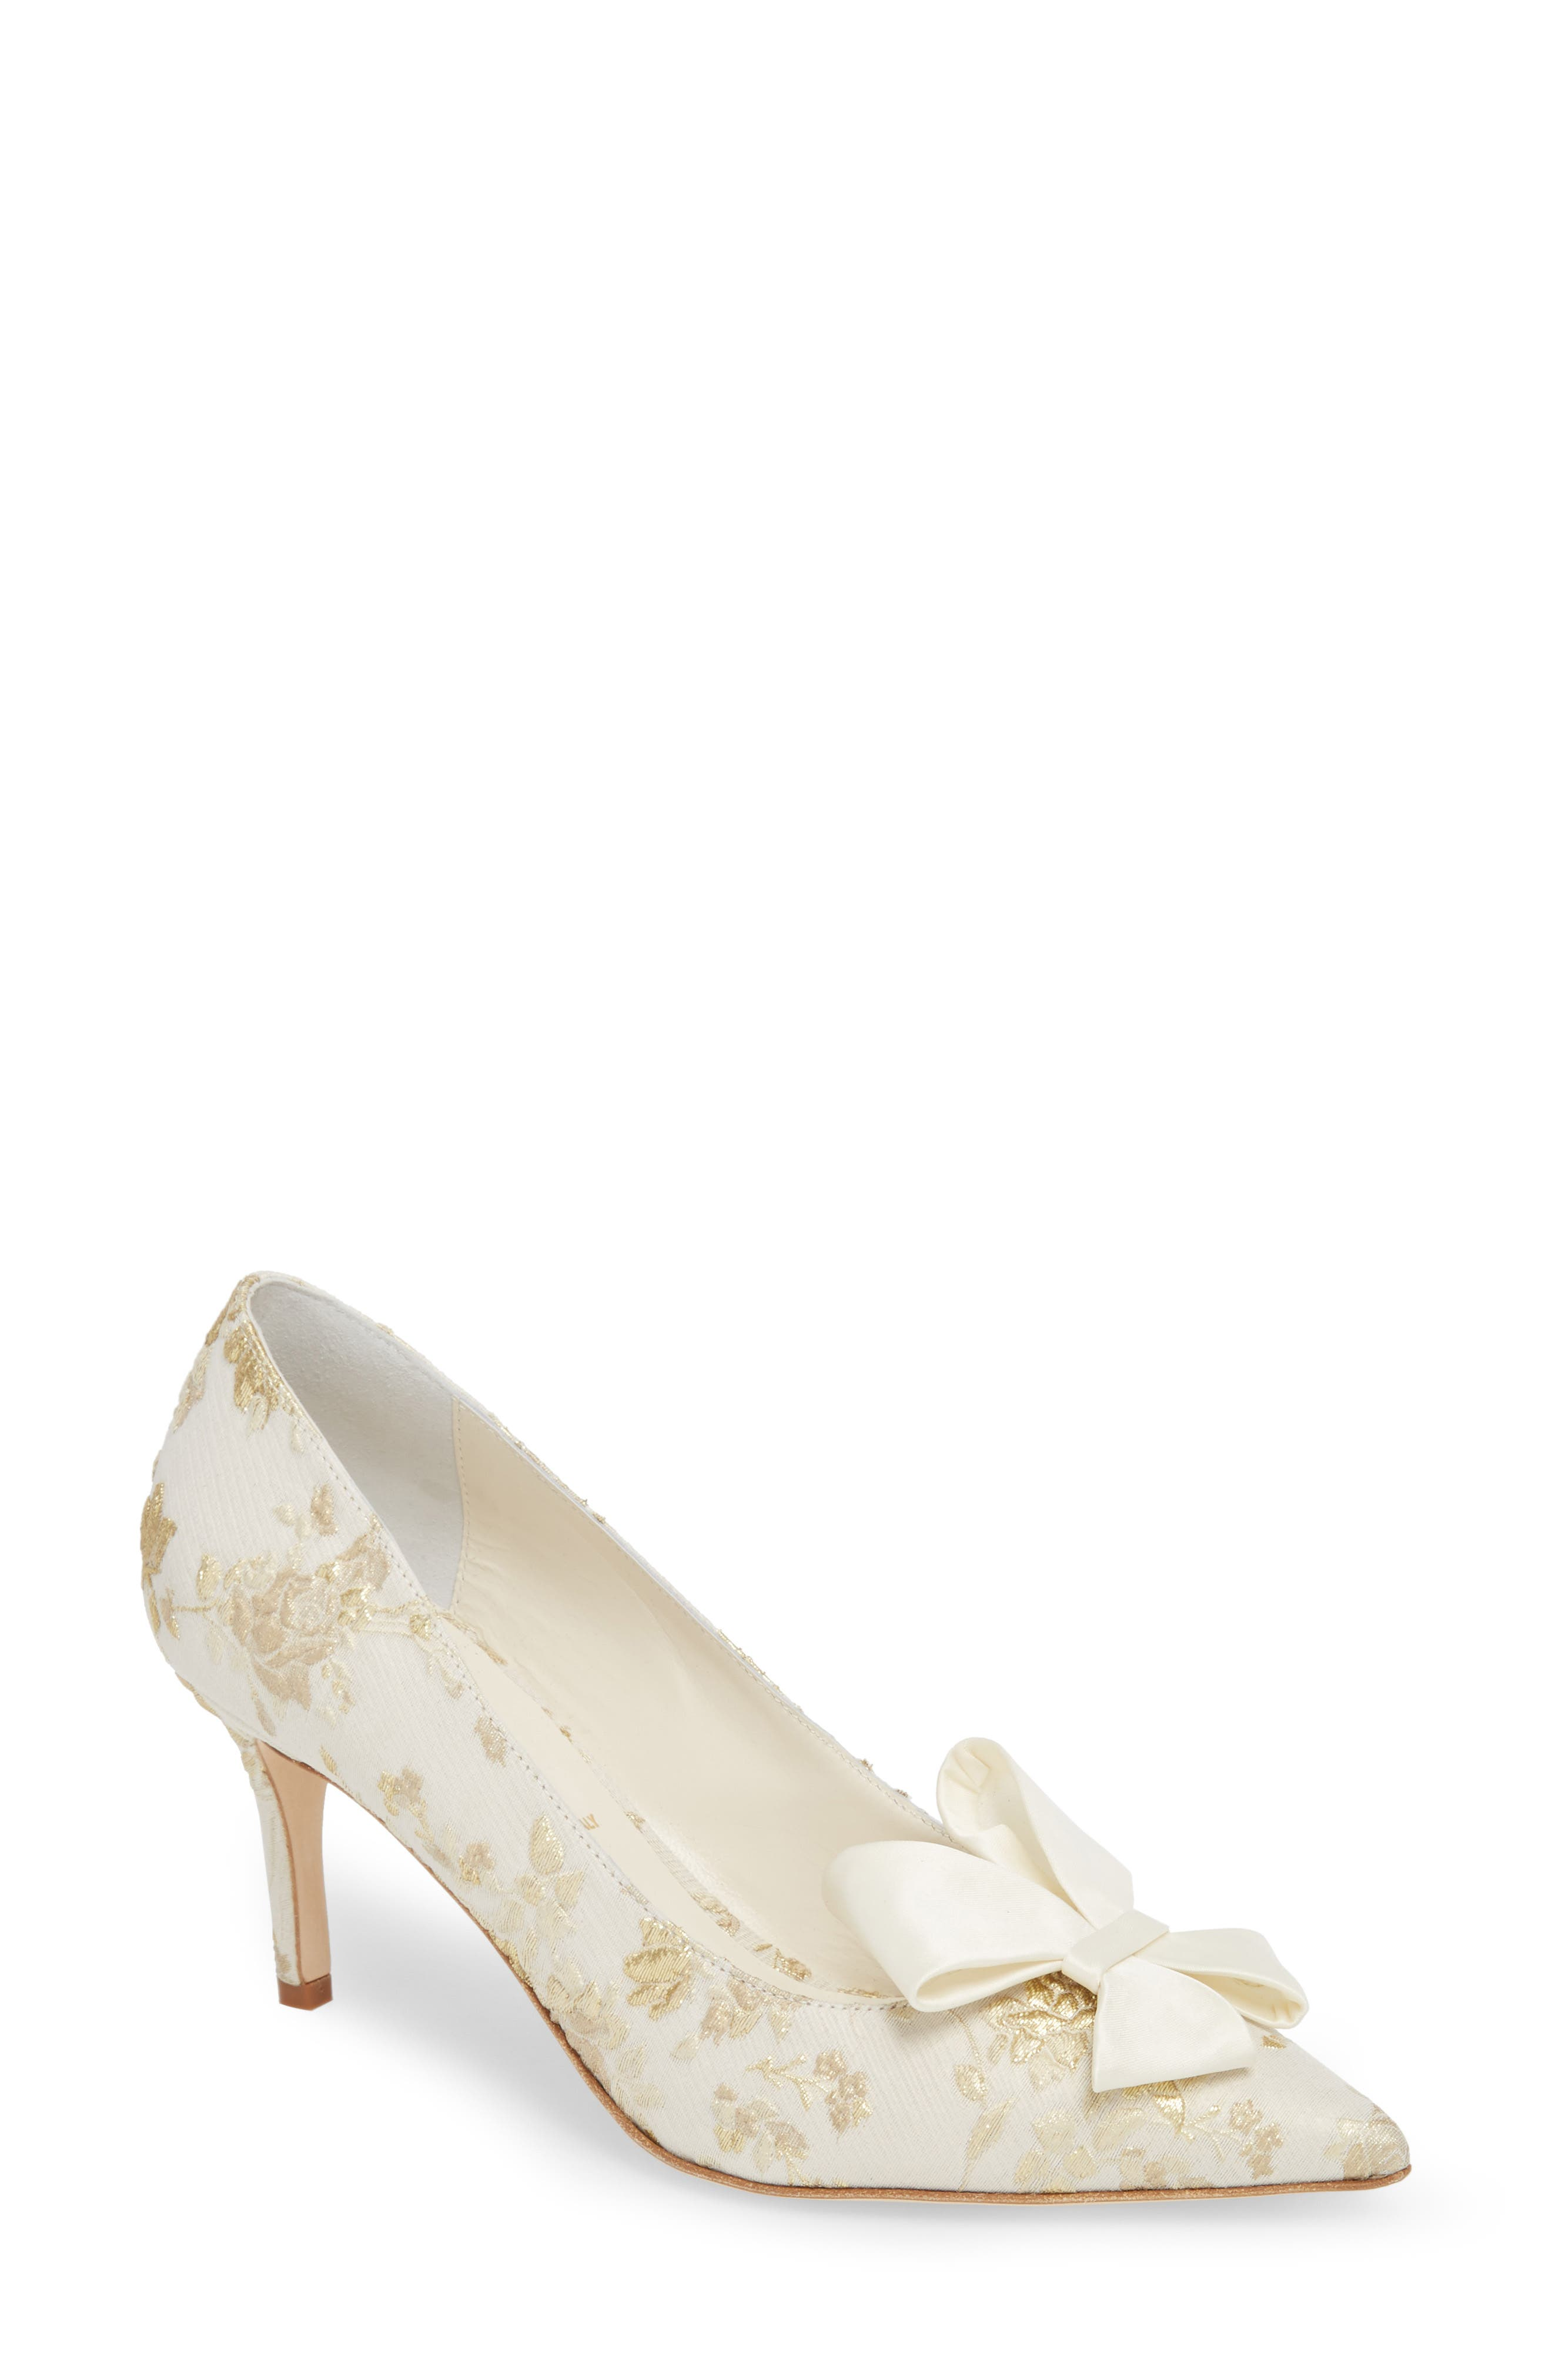 944219a4222cb Women s Something Bleu Shoes